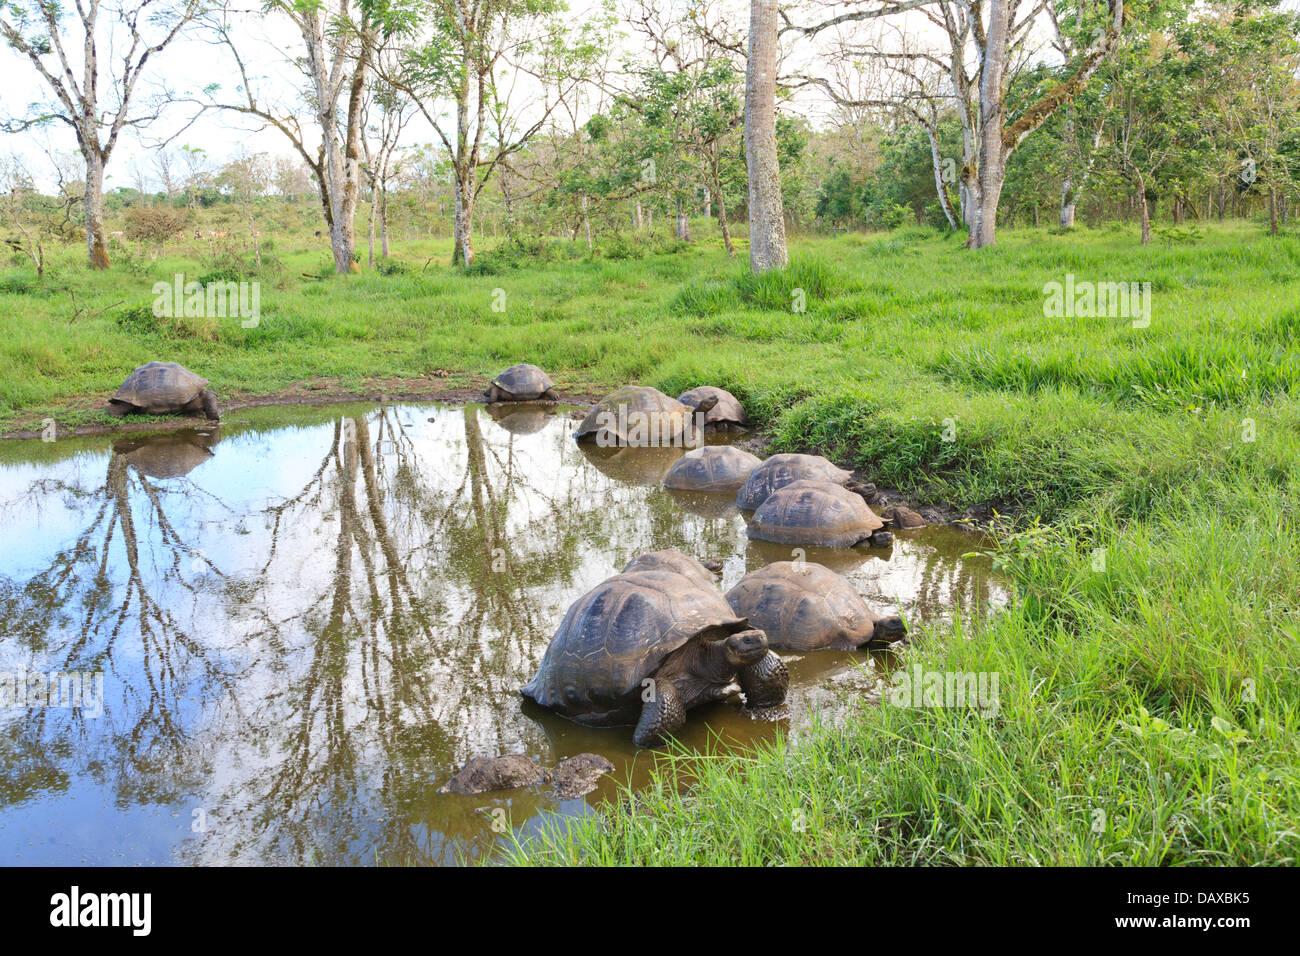 Giant Tortoise, El Chato Reserve, Santa Cruz Island, Galapagos Islands, Ecuador - Stock Image